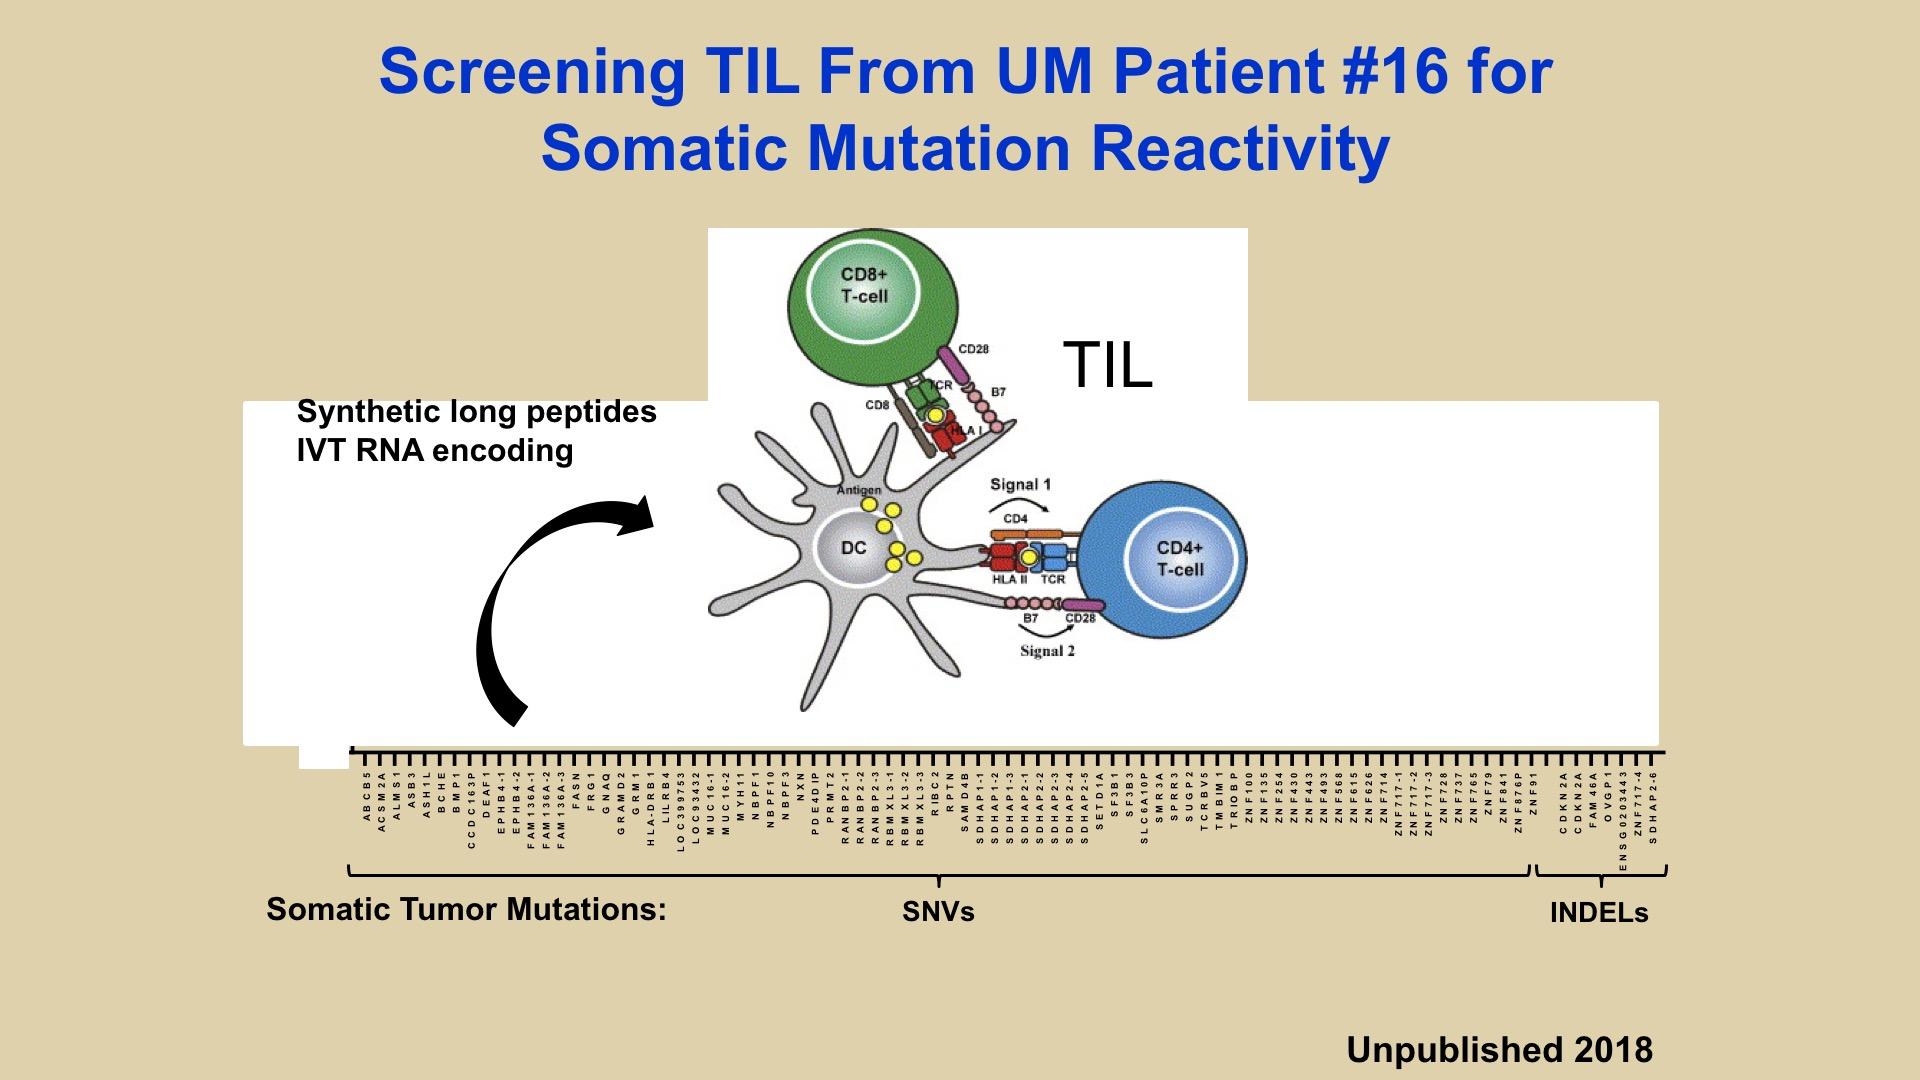 Adoptive Transfer of TIL for the Treatment of Metastatic